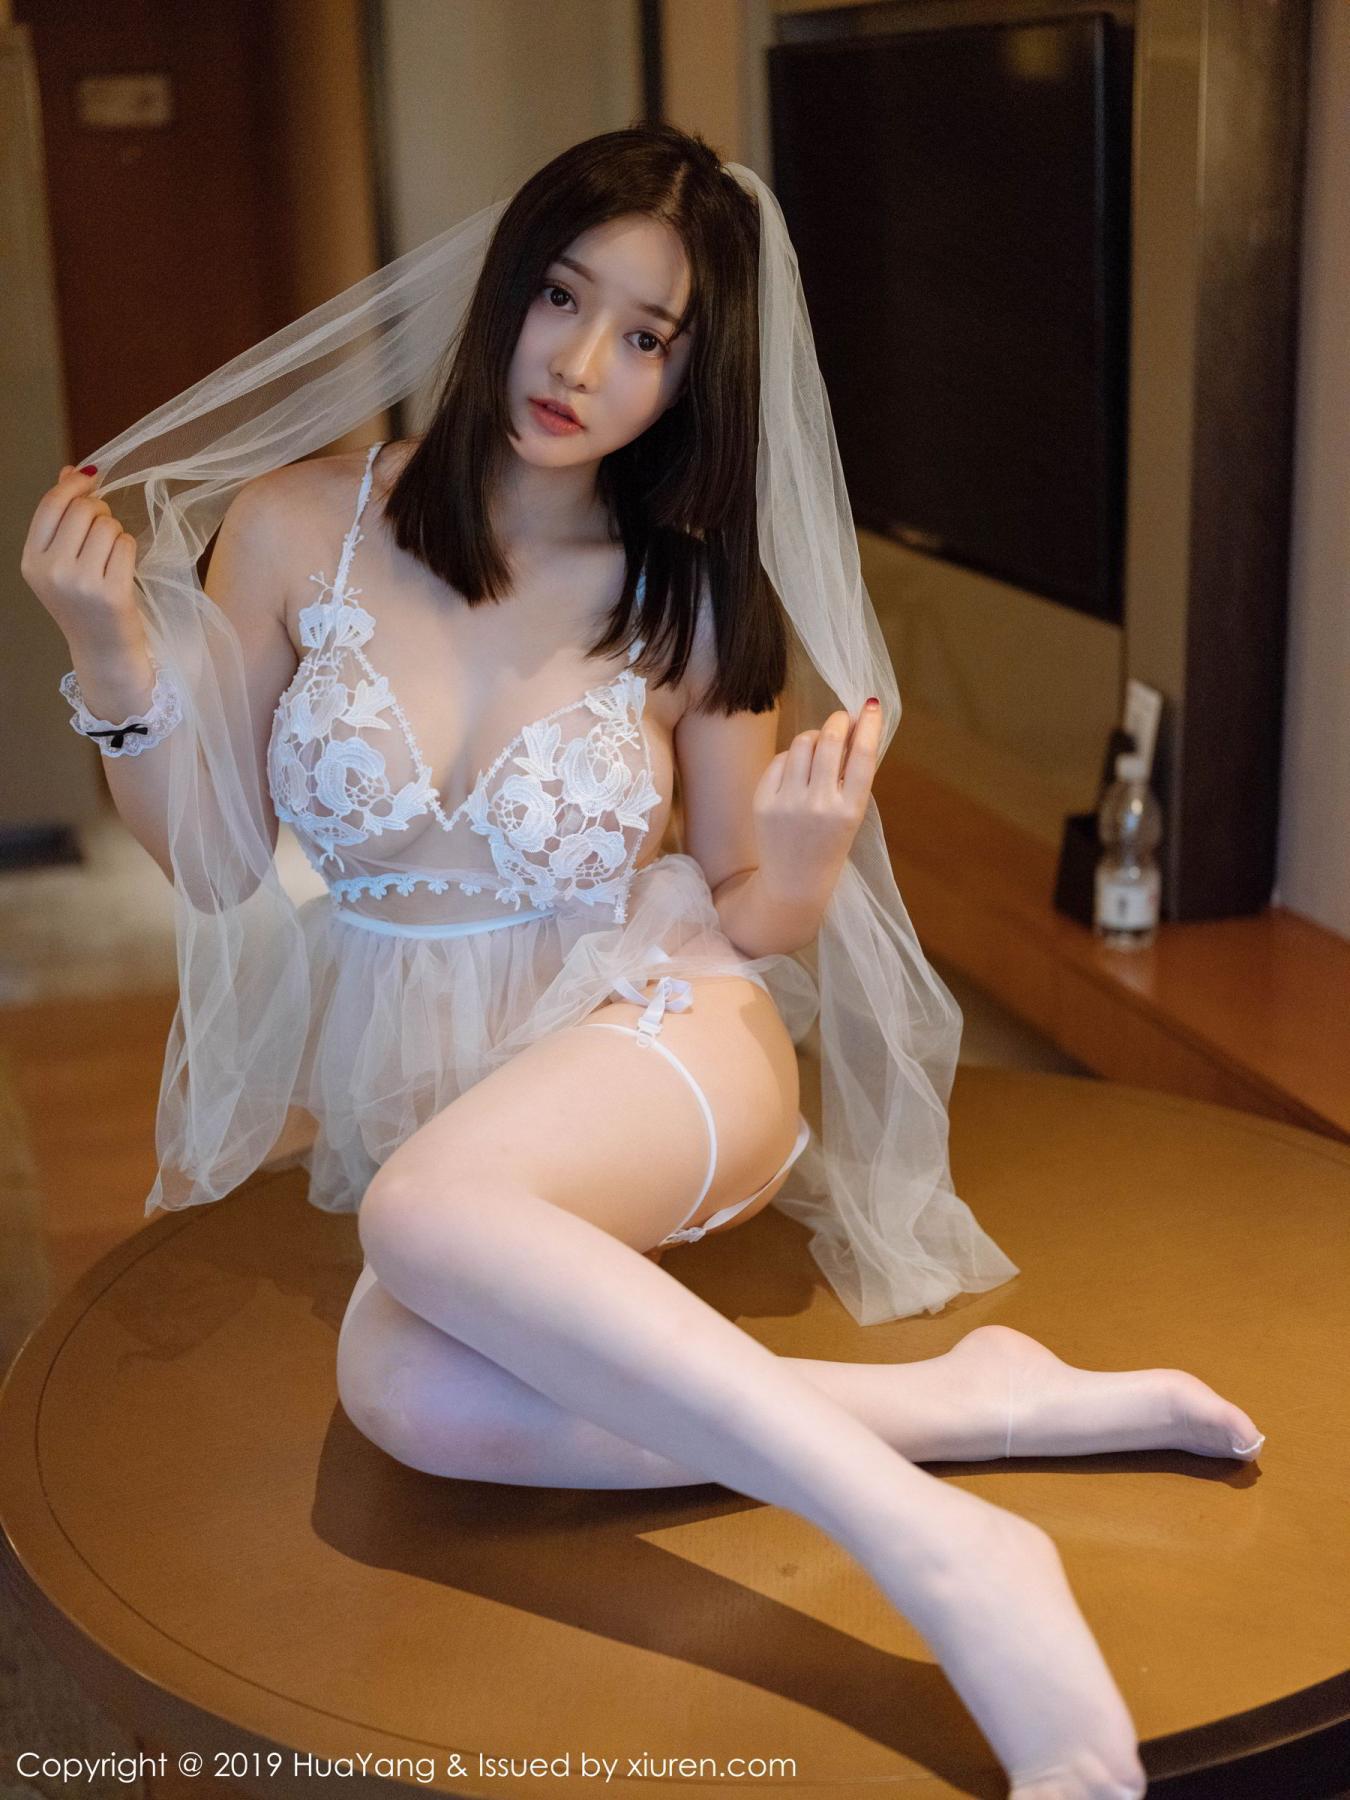 [Huayang] Vol.122 Bride Tang Wan Er 28P, HuaYang, Tang Wan Er, Underwear